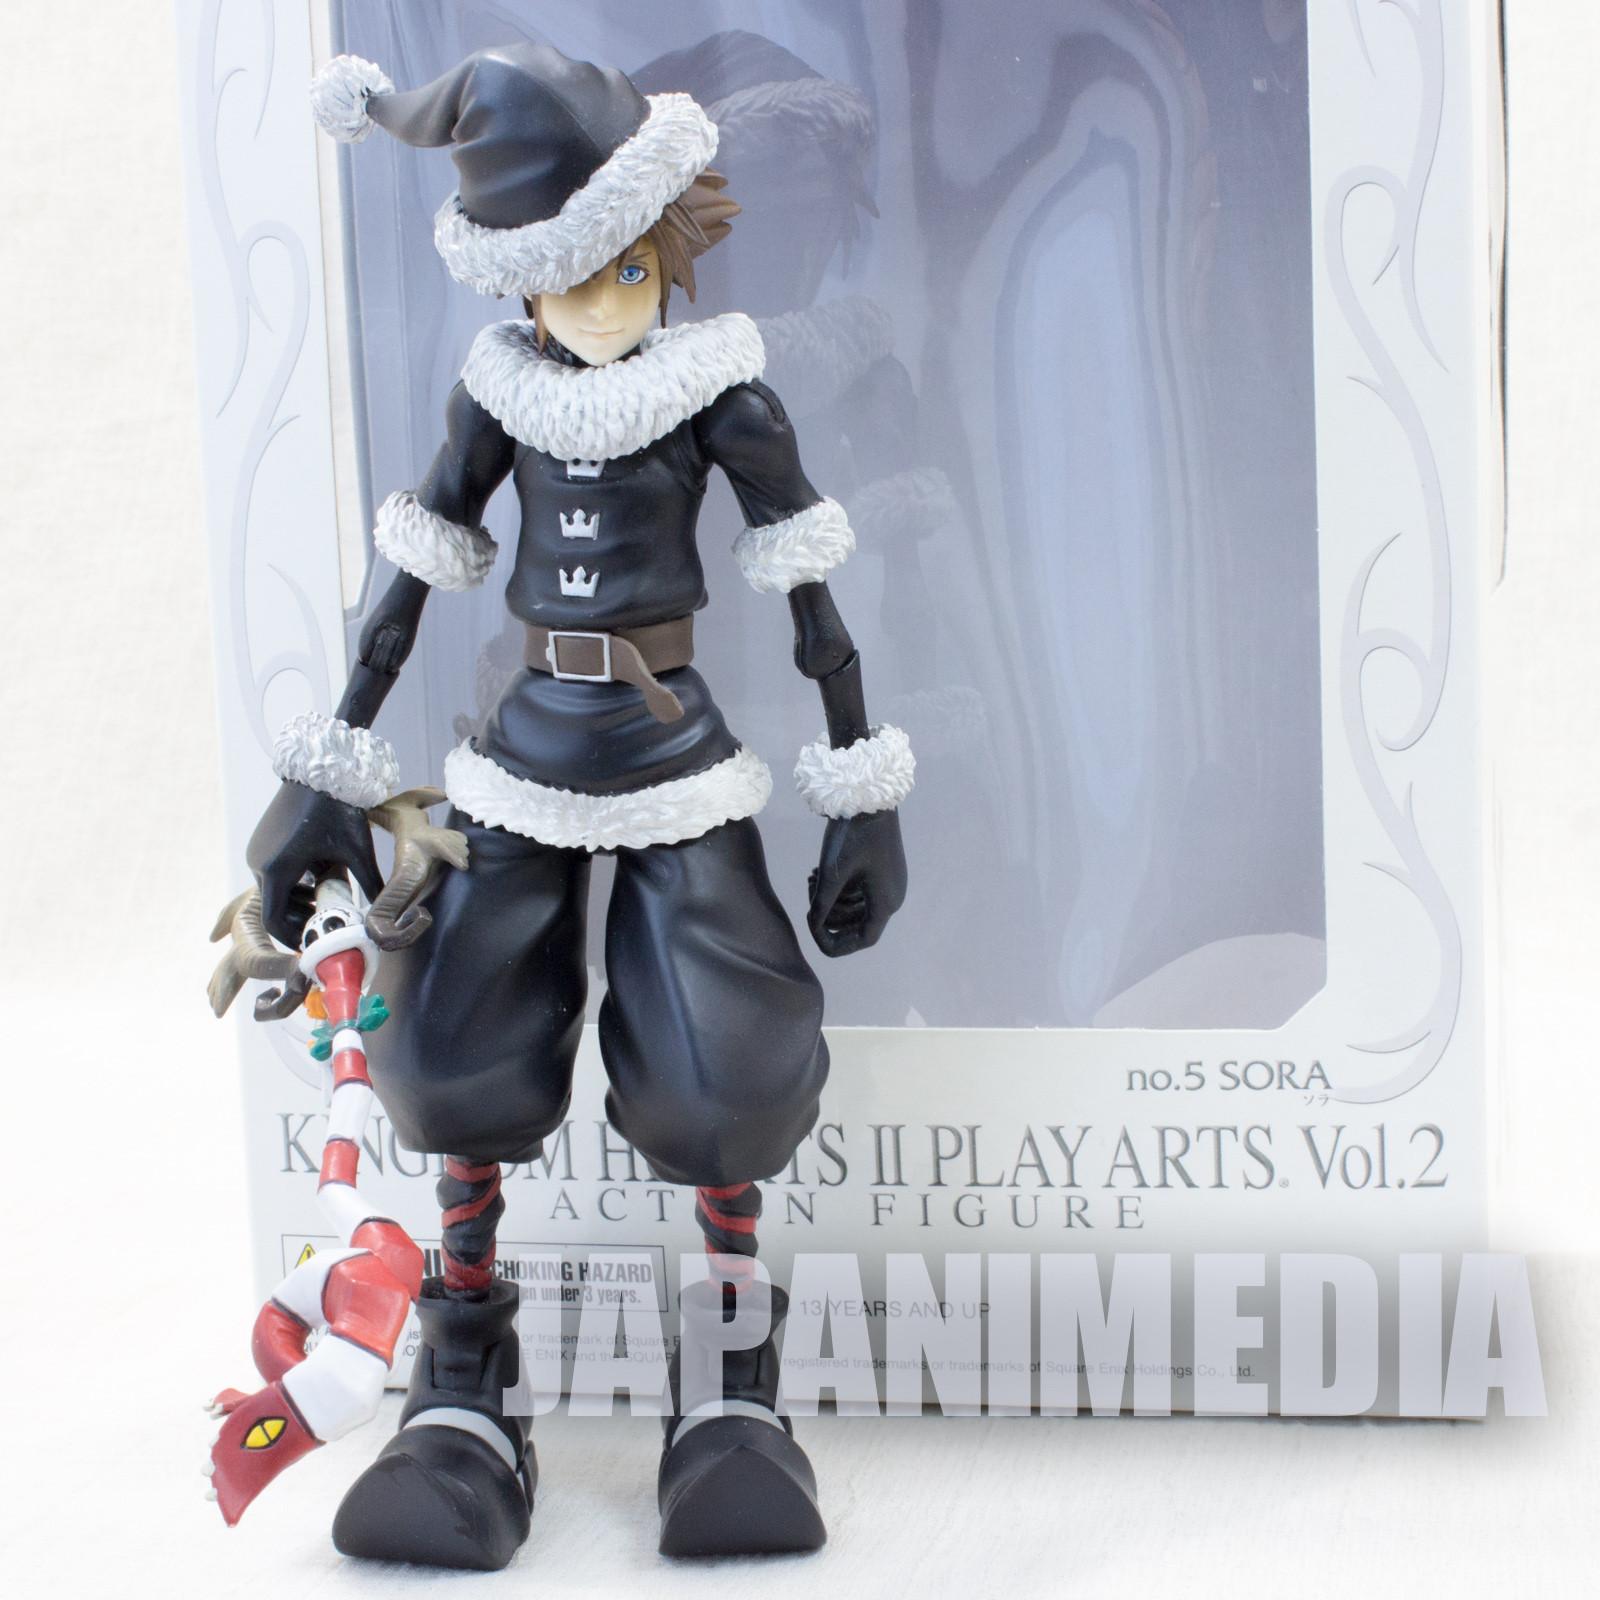 Kingdom Hearts 2 SORA Play Arts vol.2 Action Figure Christmas Town ver Square Enix JAPAN